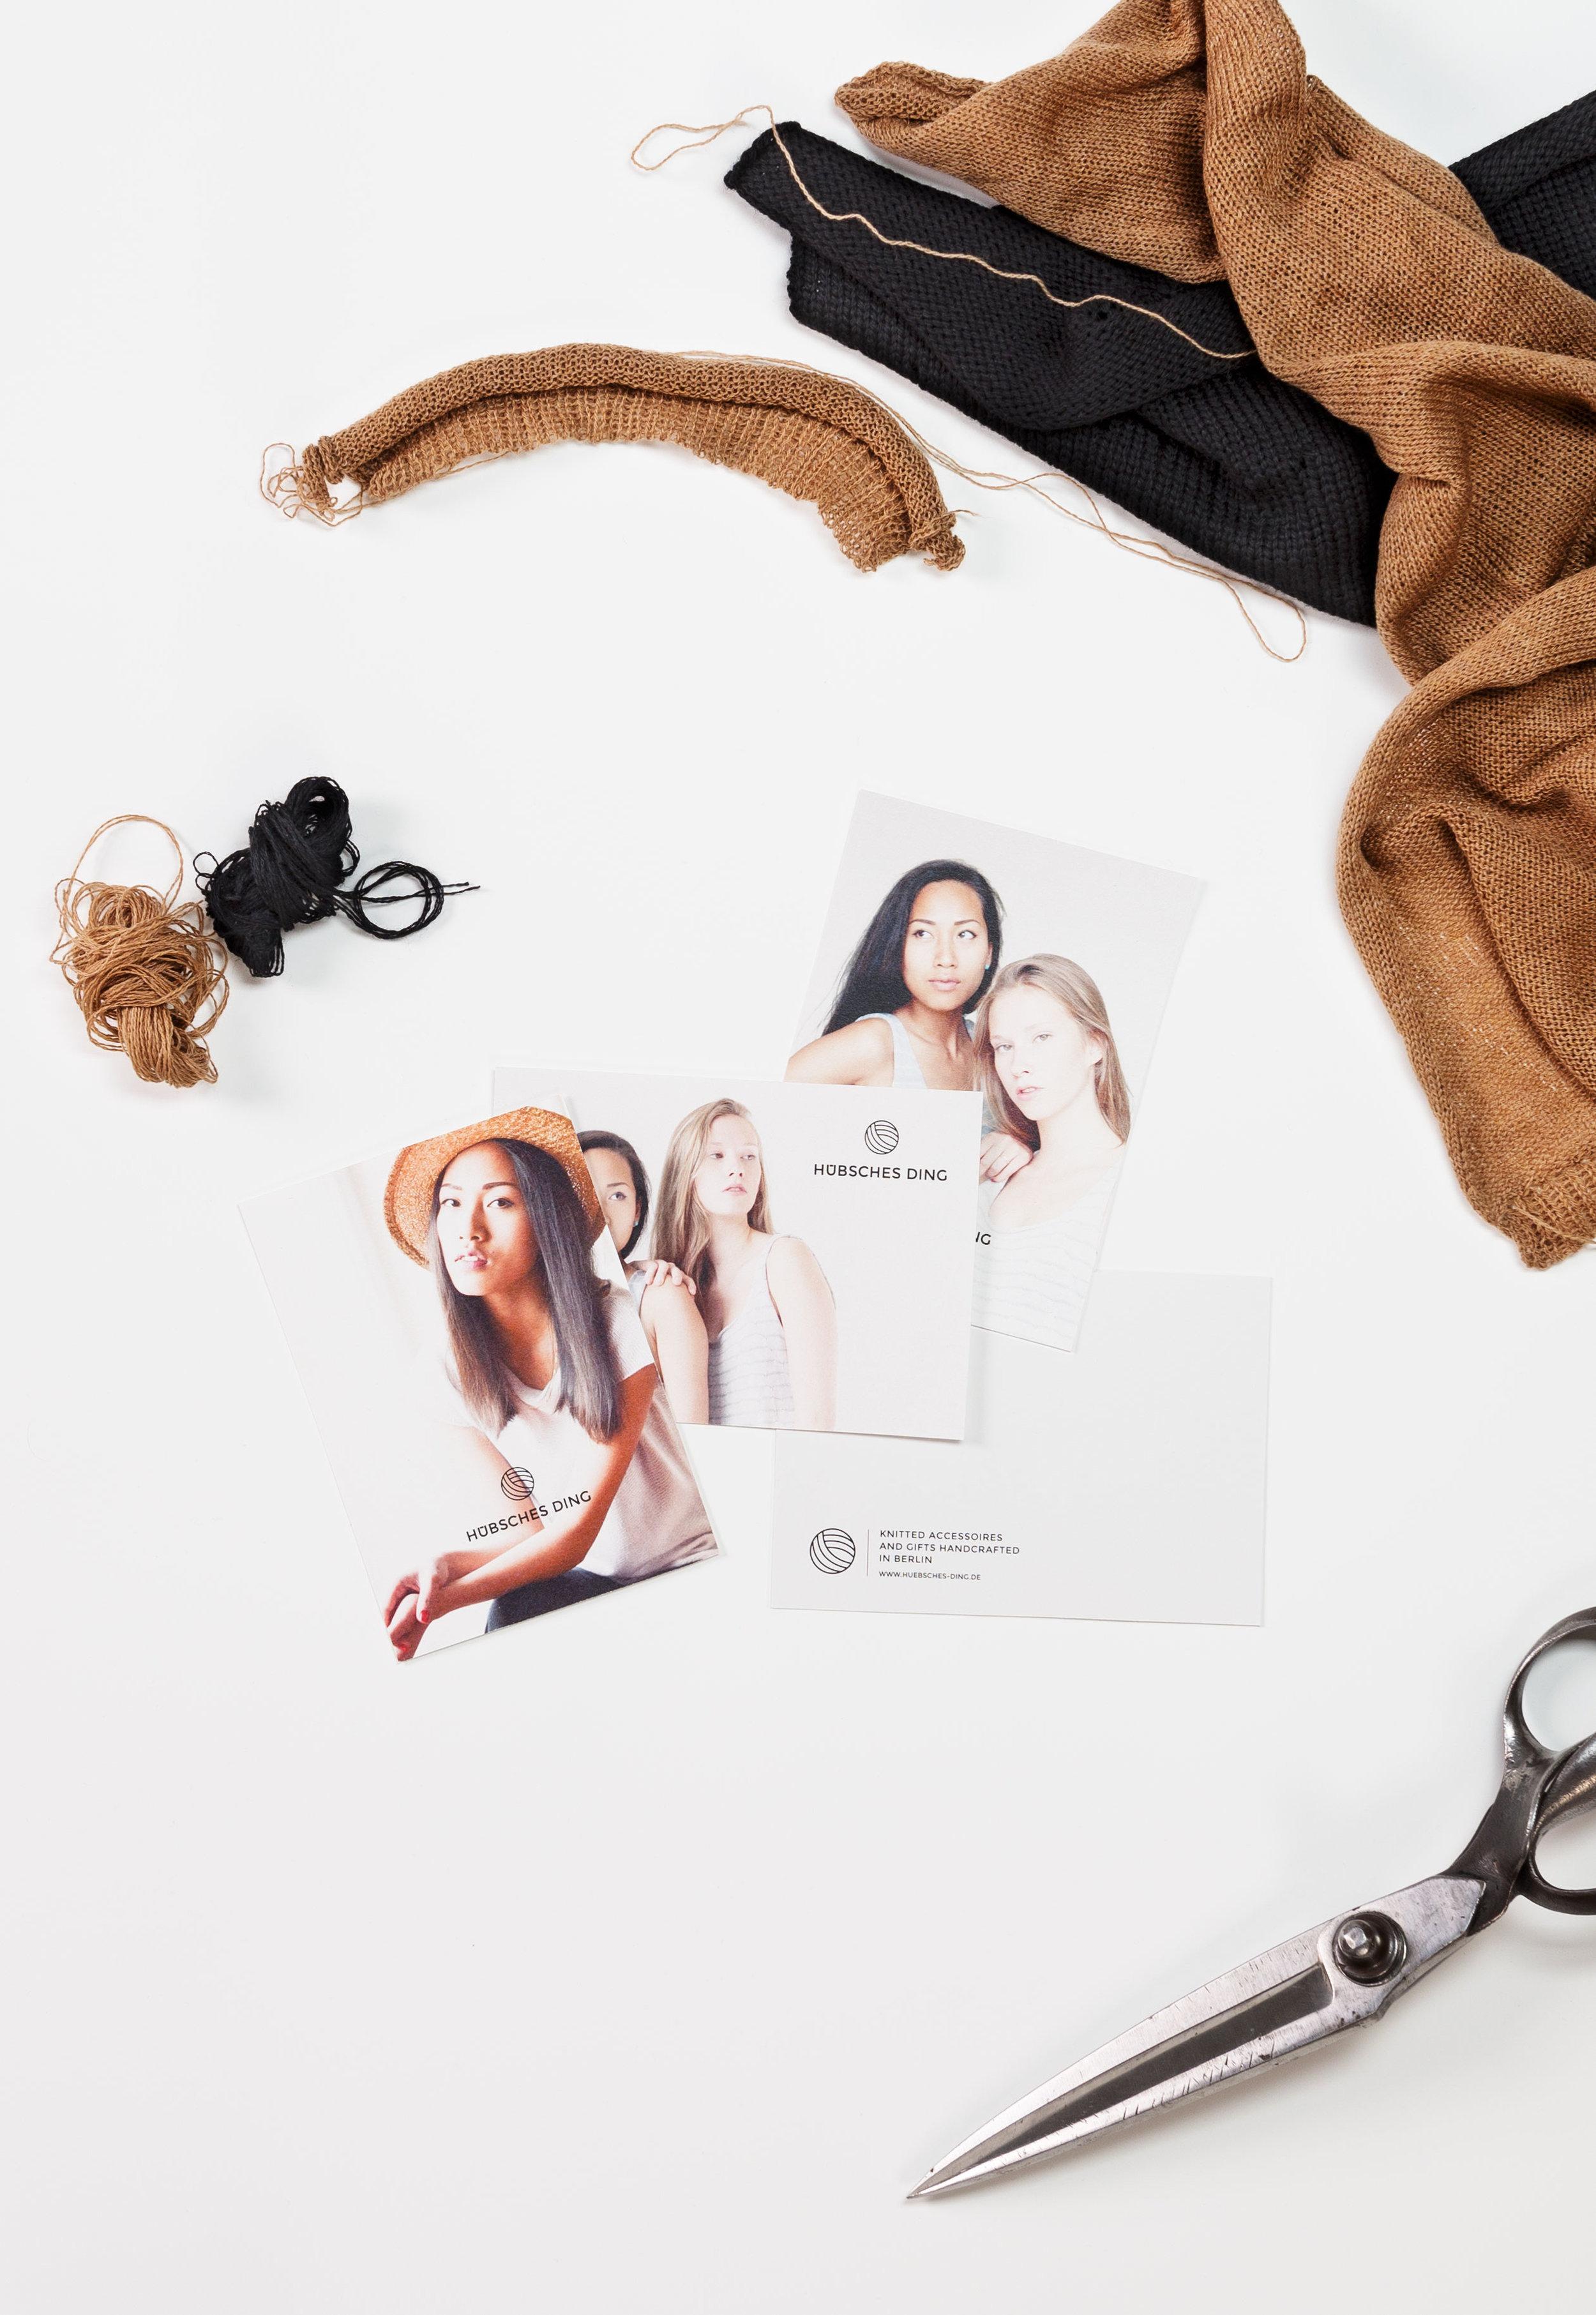 Lena Hanzel – Visual Identity – Hübsches Ding